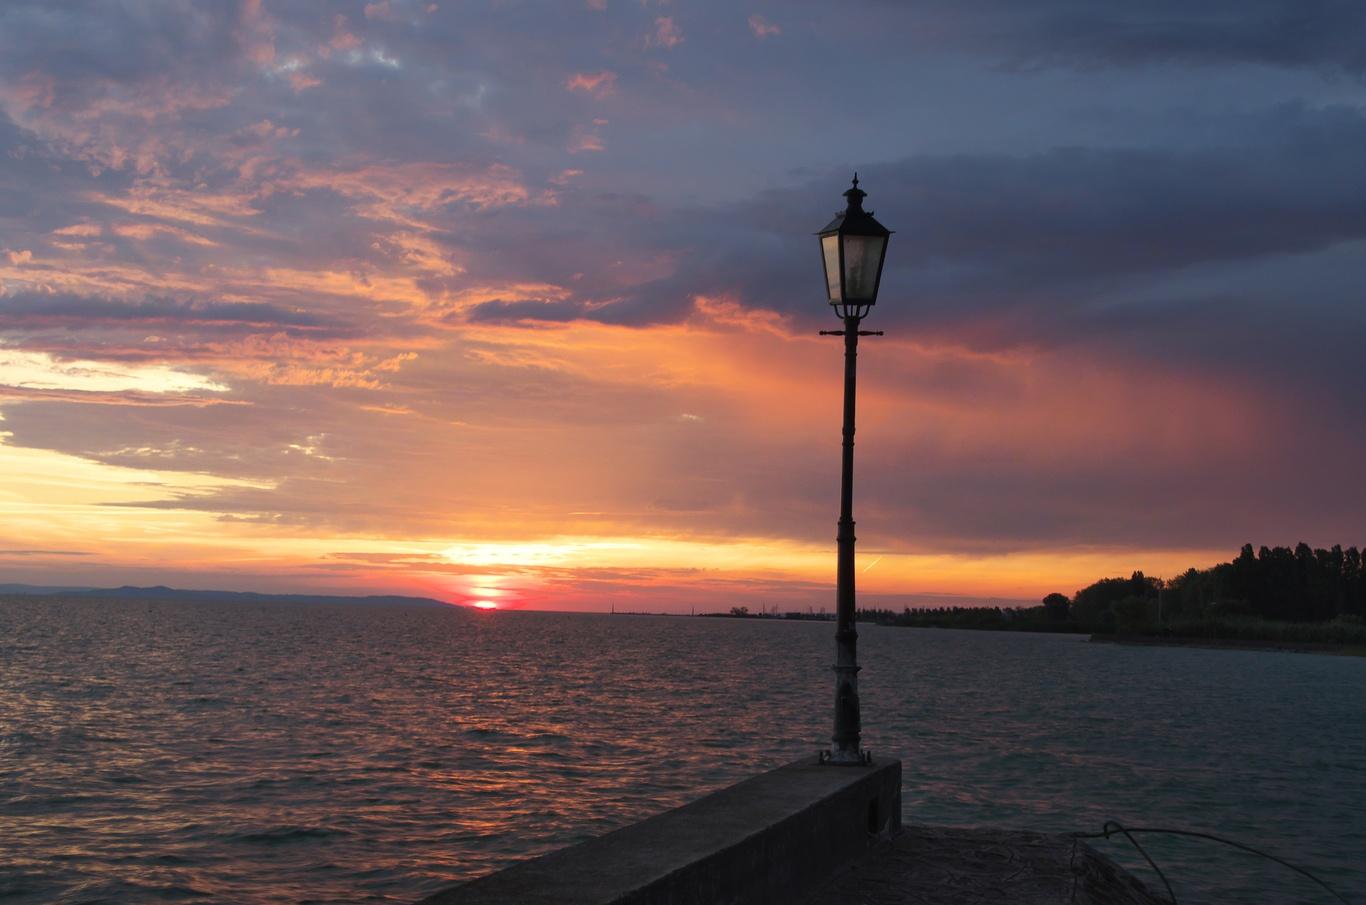 Východ slunce nad Balatonem